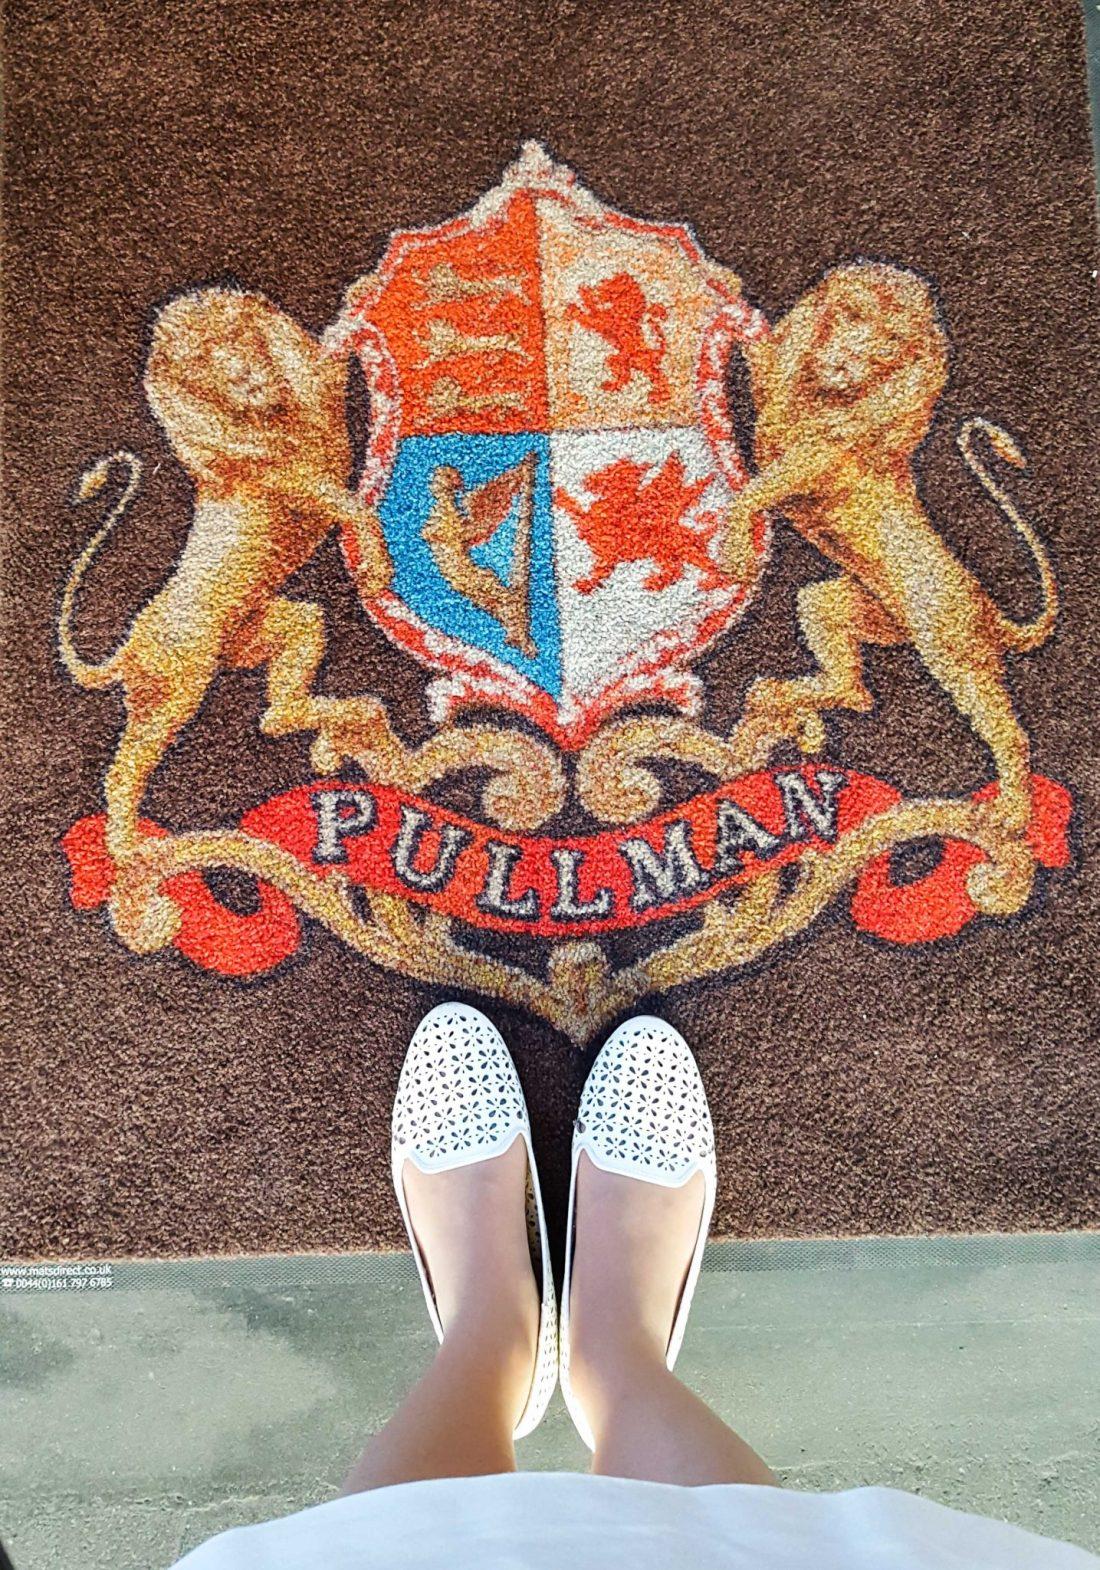 Bellmond_British_Pullman_Review